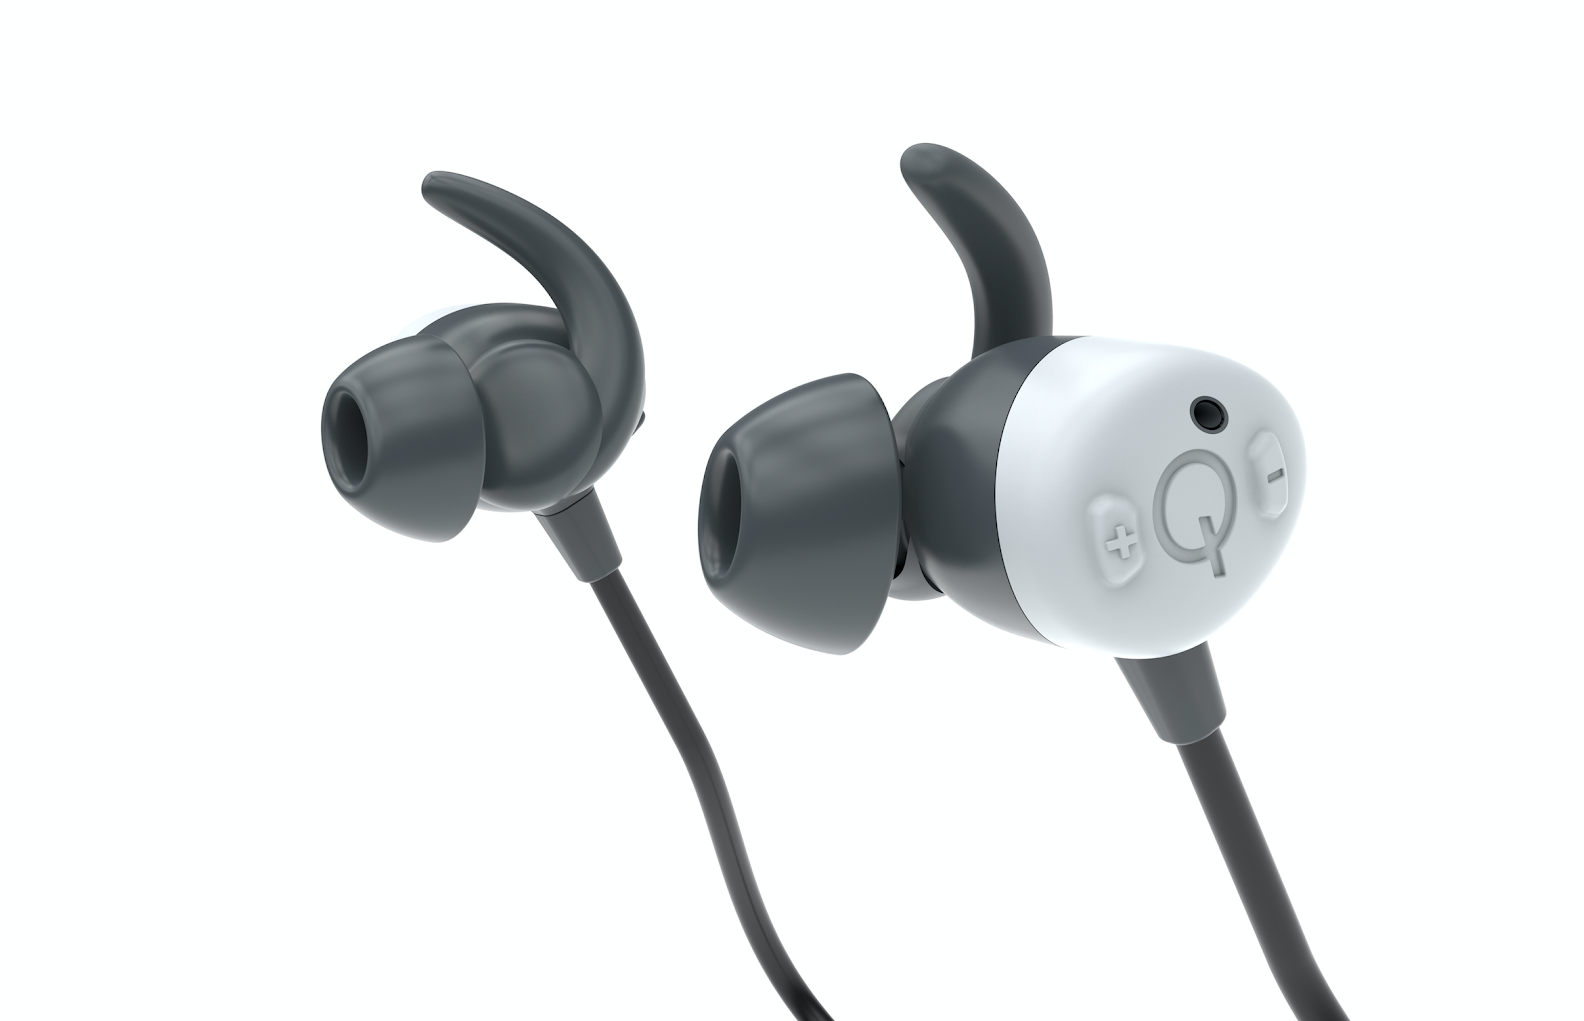 Qualcomm Smart Headset